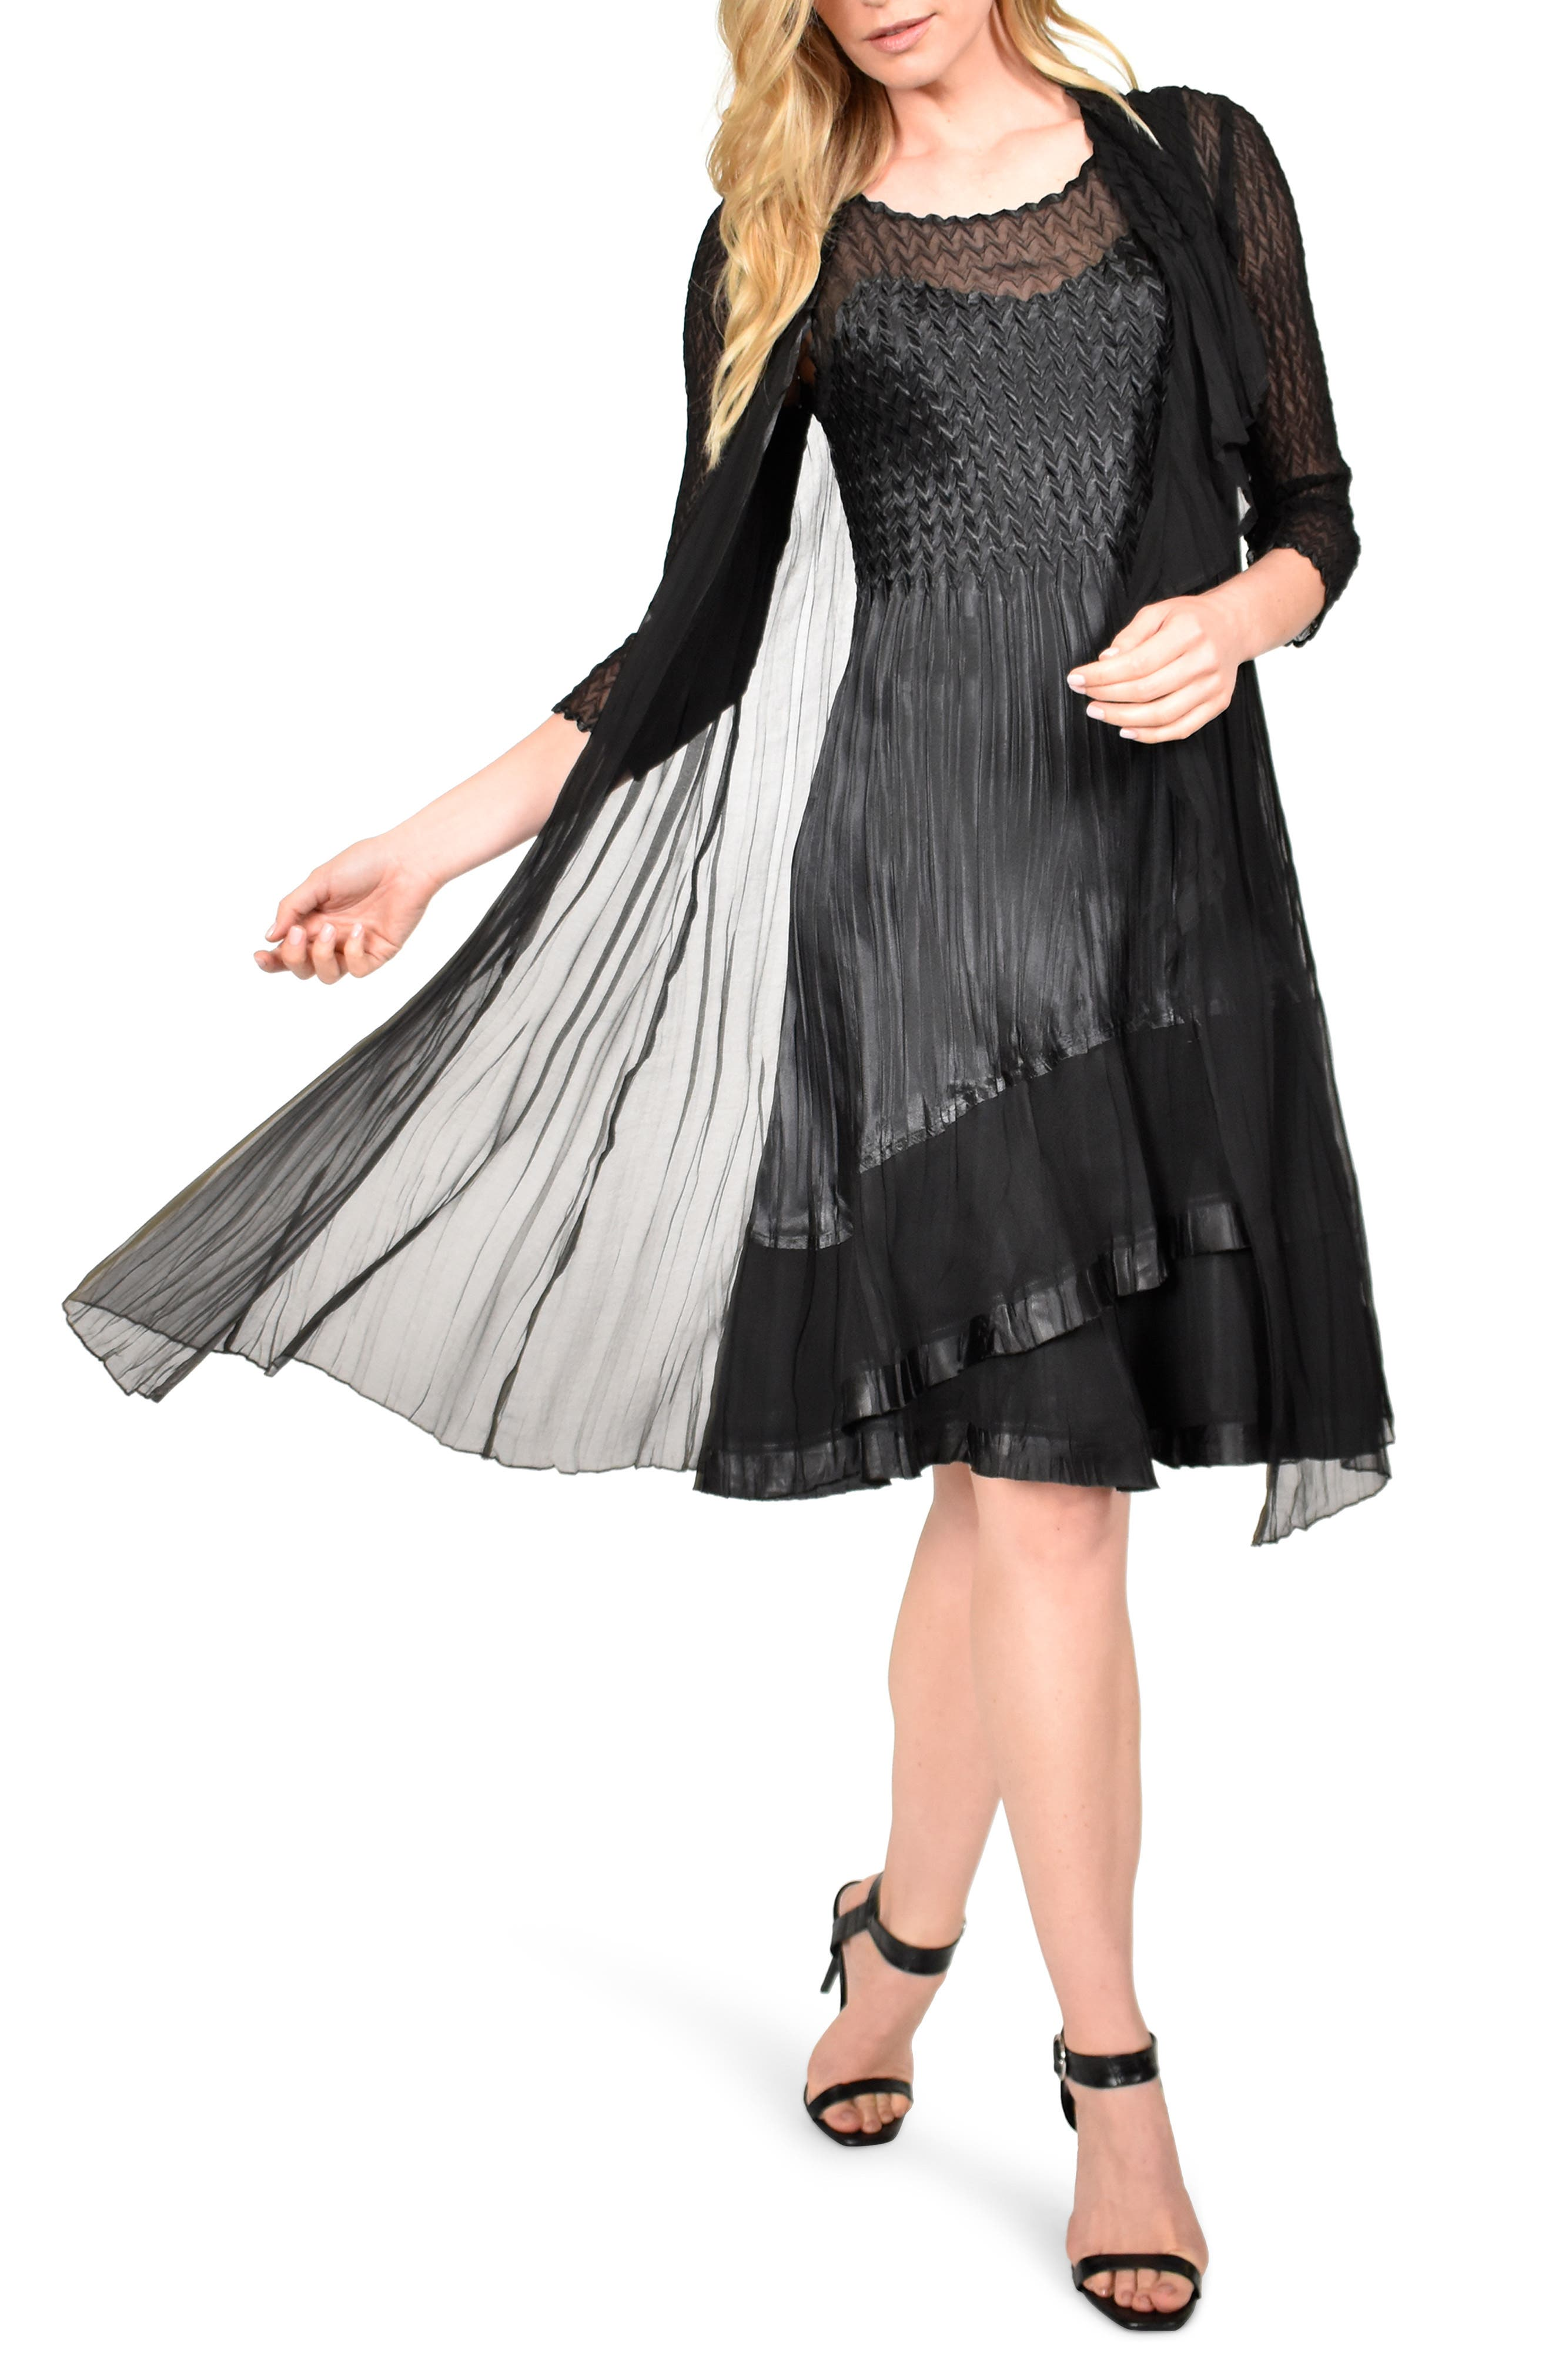 Vintage 1920s Dresses – Where to Buy Womens Komarov Charmeuse Dress With Long Jacket $448.00 AT vintagedancer.com